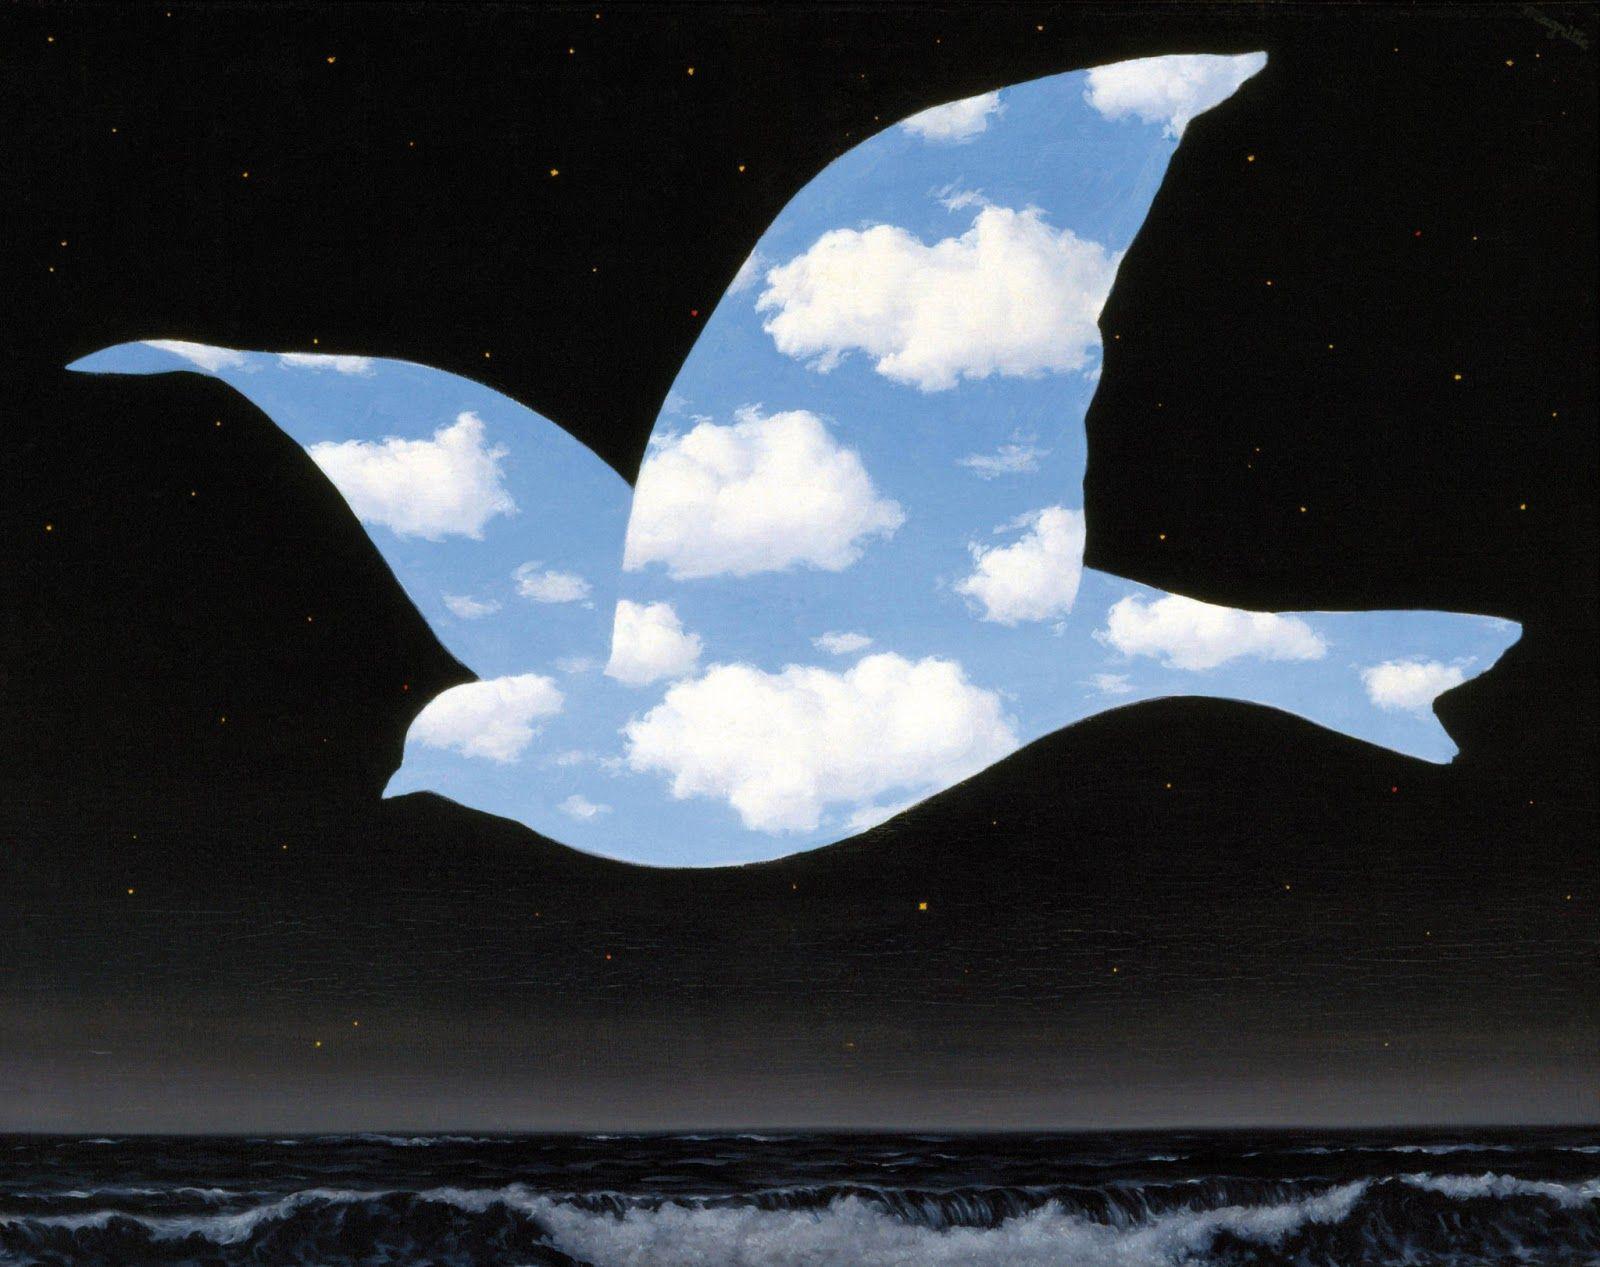 Rene Francois Ghislain Magritte マグリット シュルレアリスム 絵画